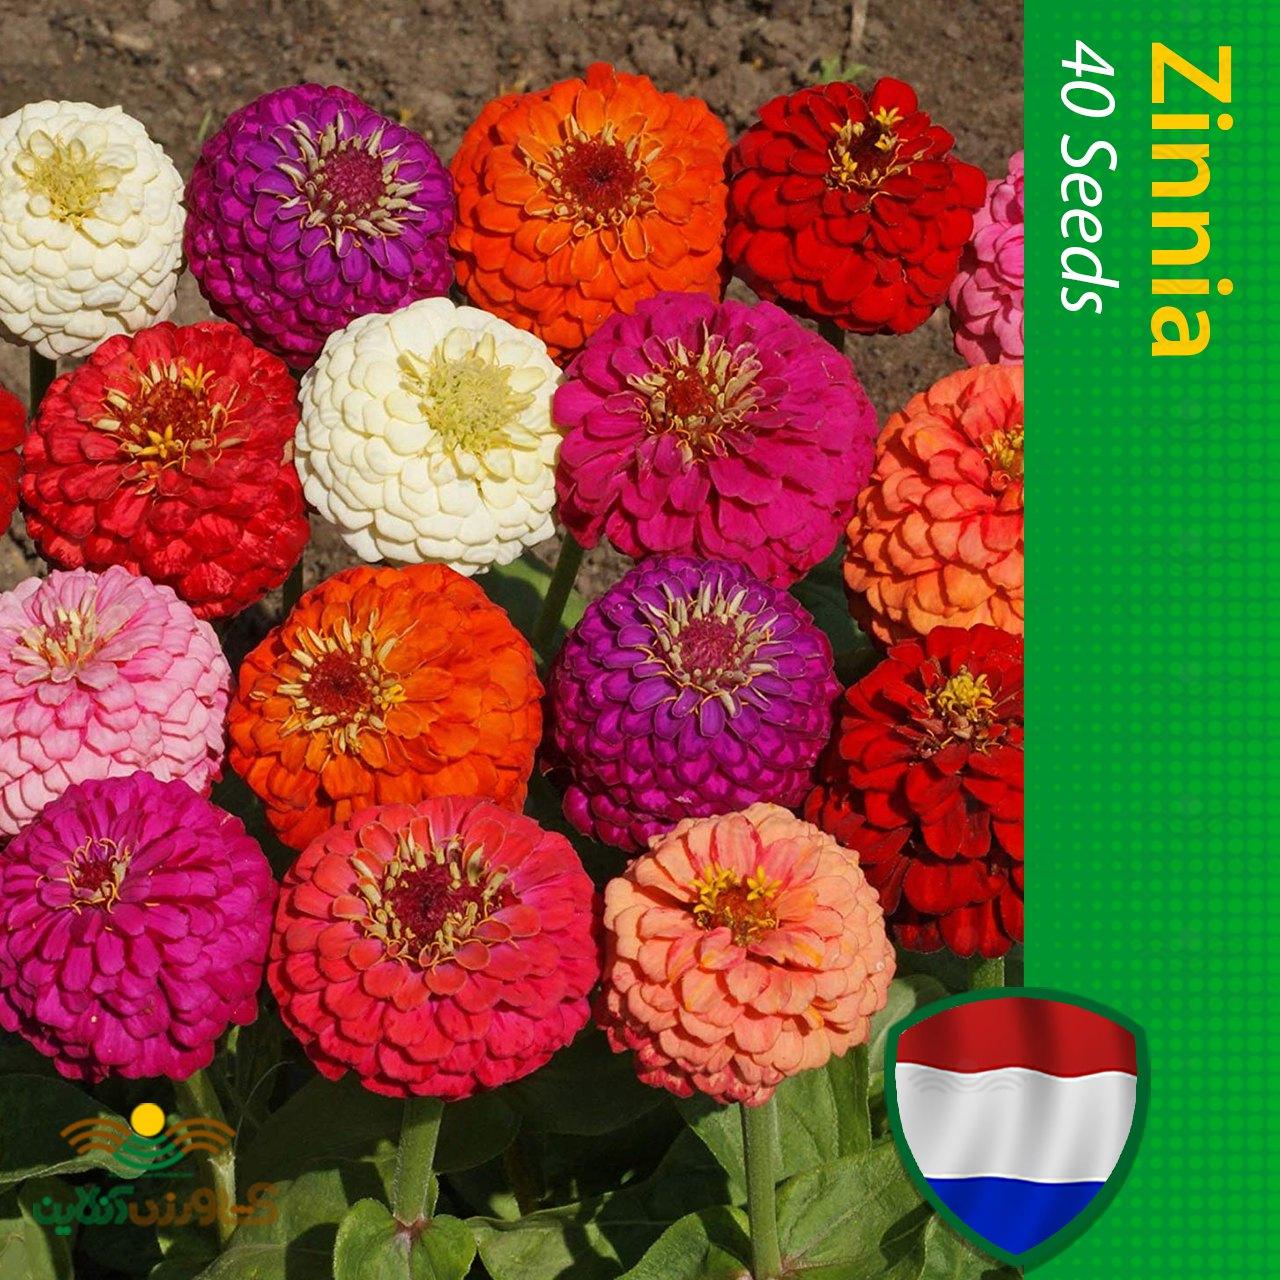 بذر گل آهار هلندی الوان